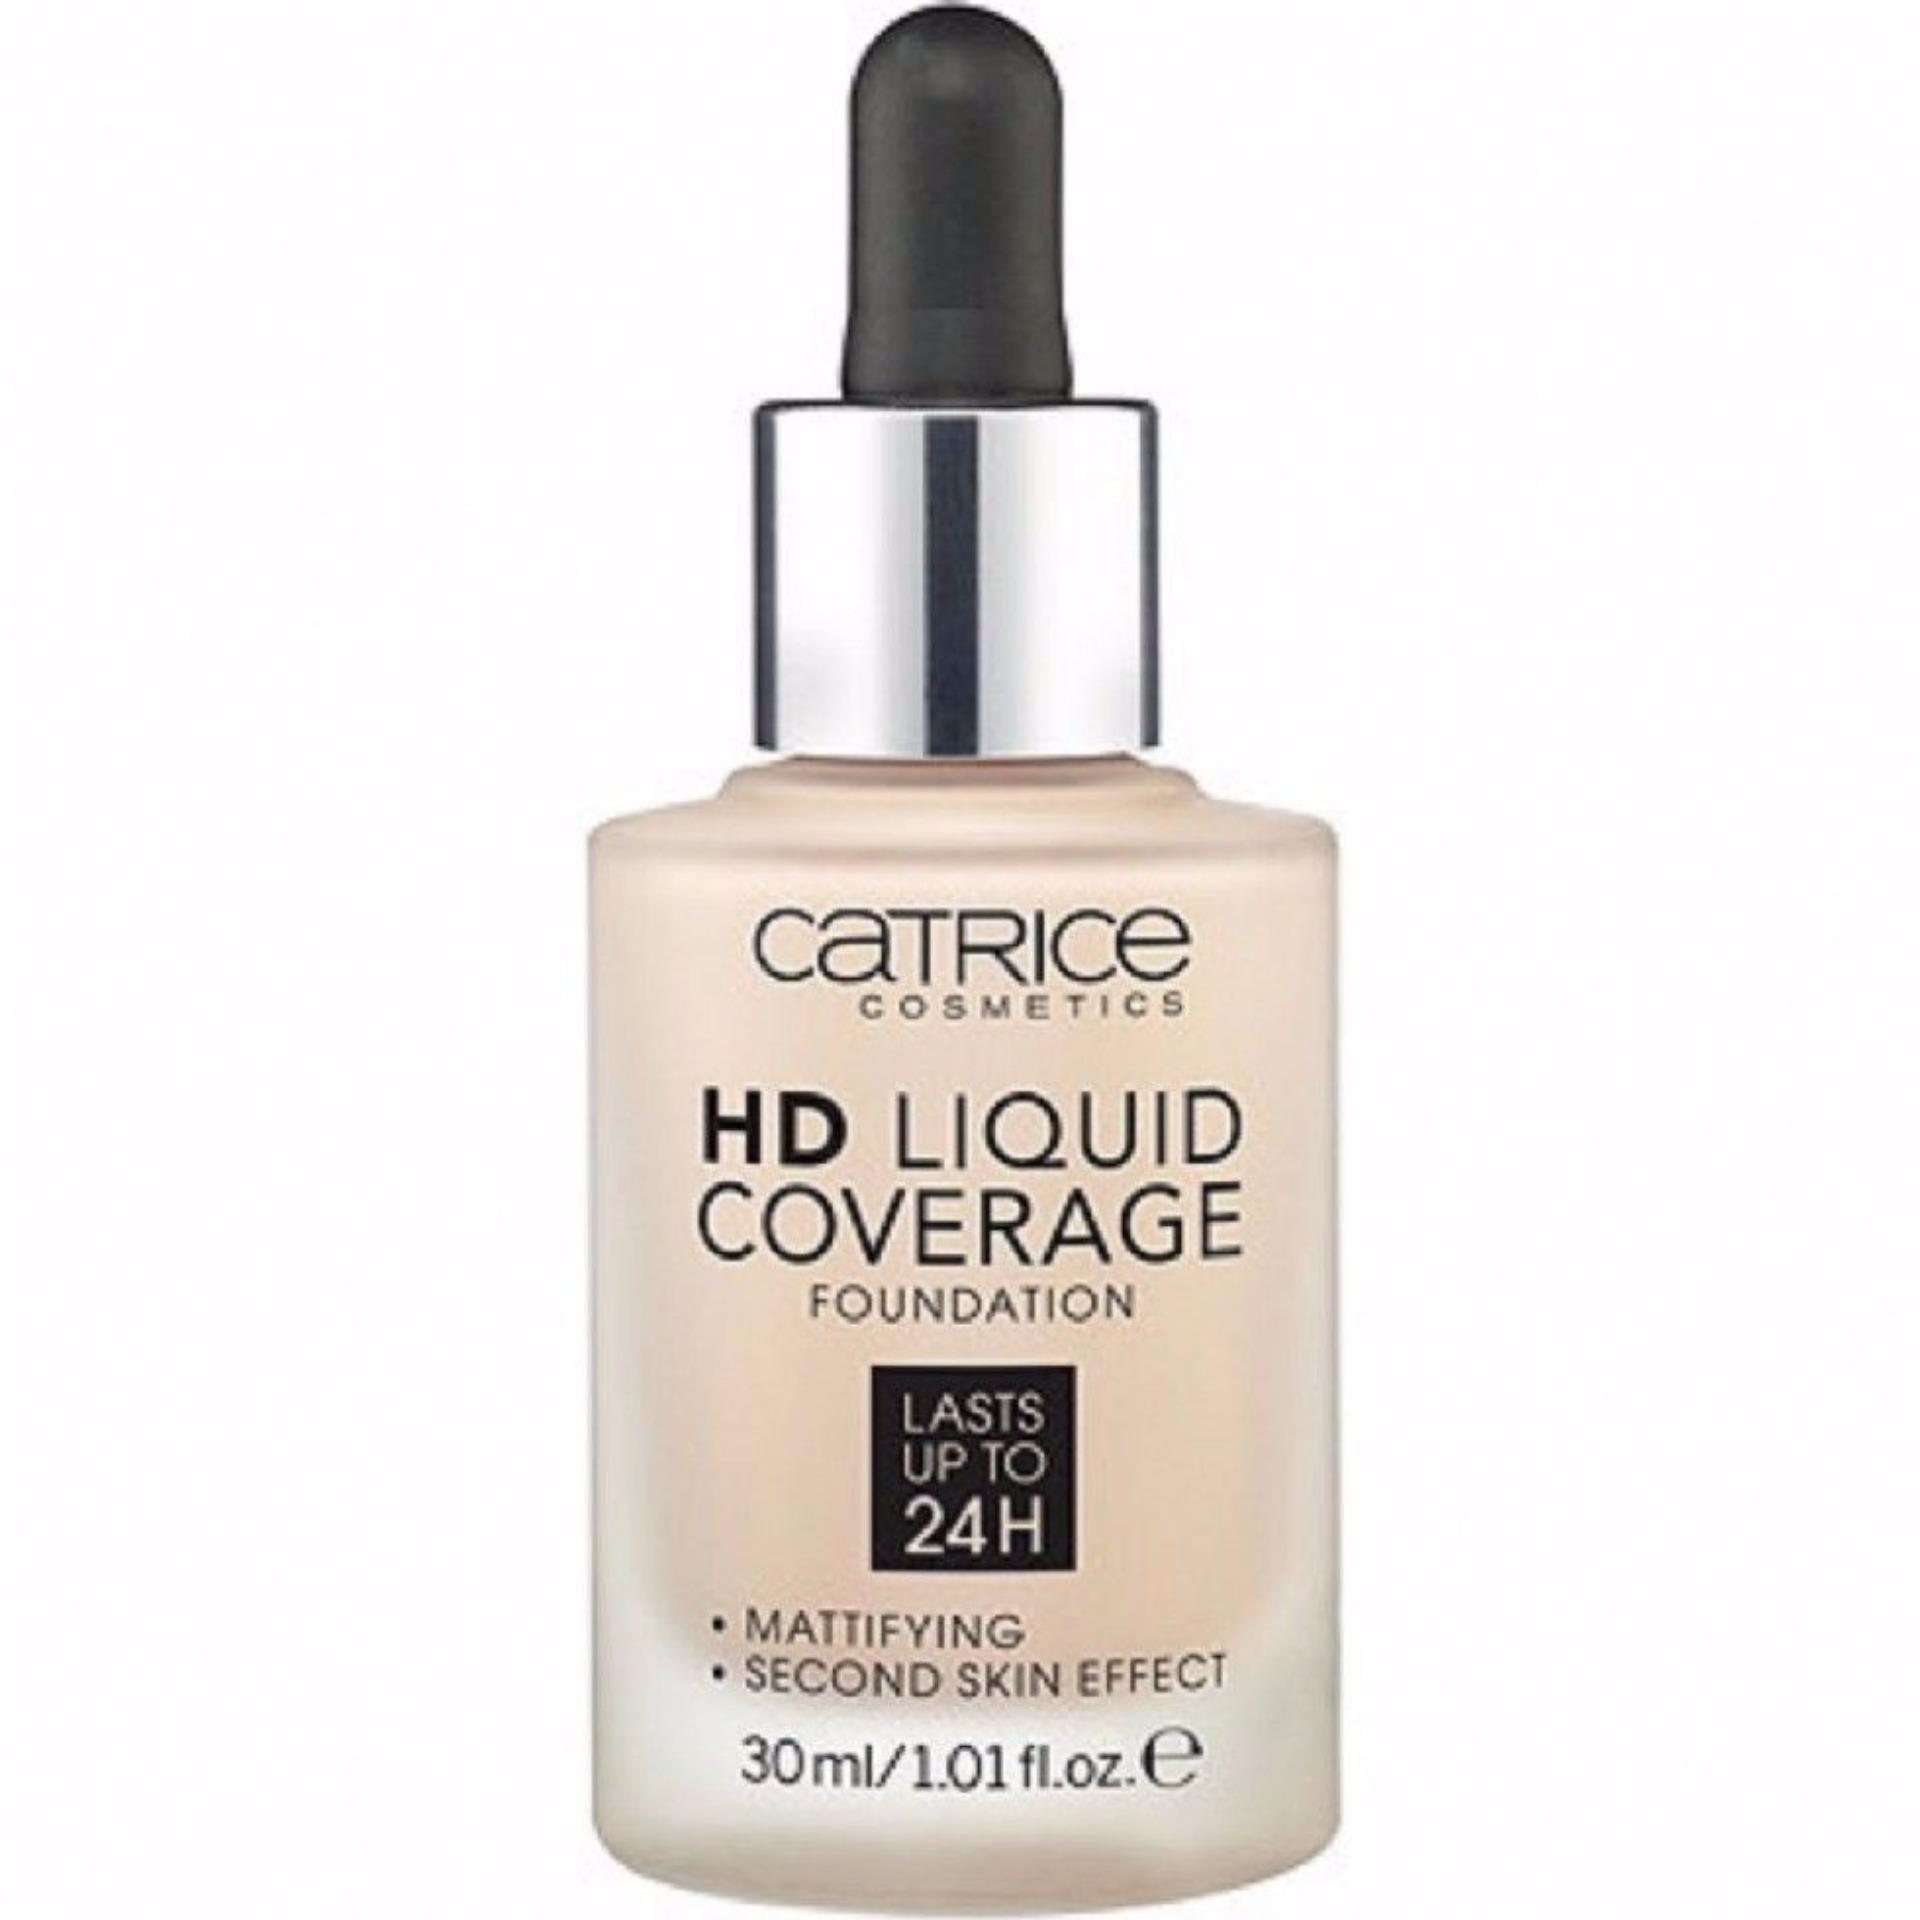 Kem nền kiềm dầu che khuyết điểm Catrice Liquid Coverage 30ml (Da tự nhiên)